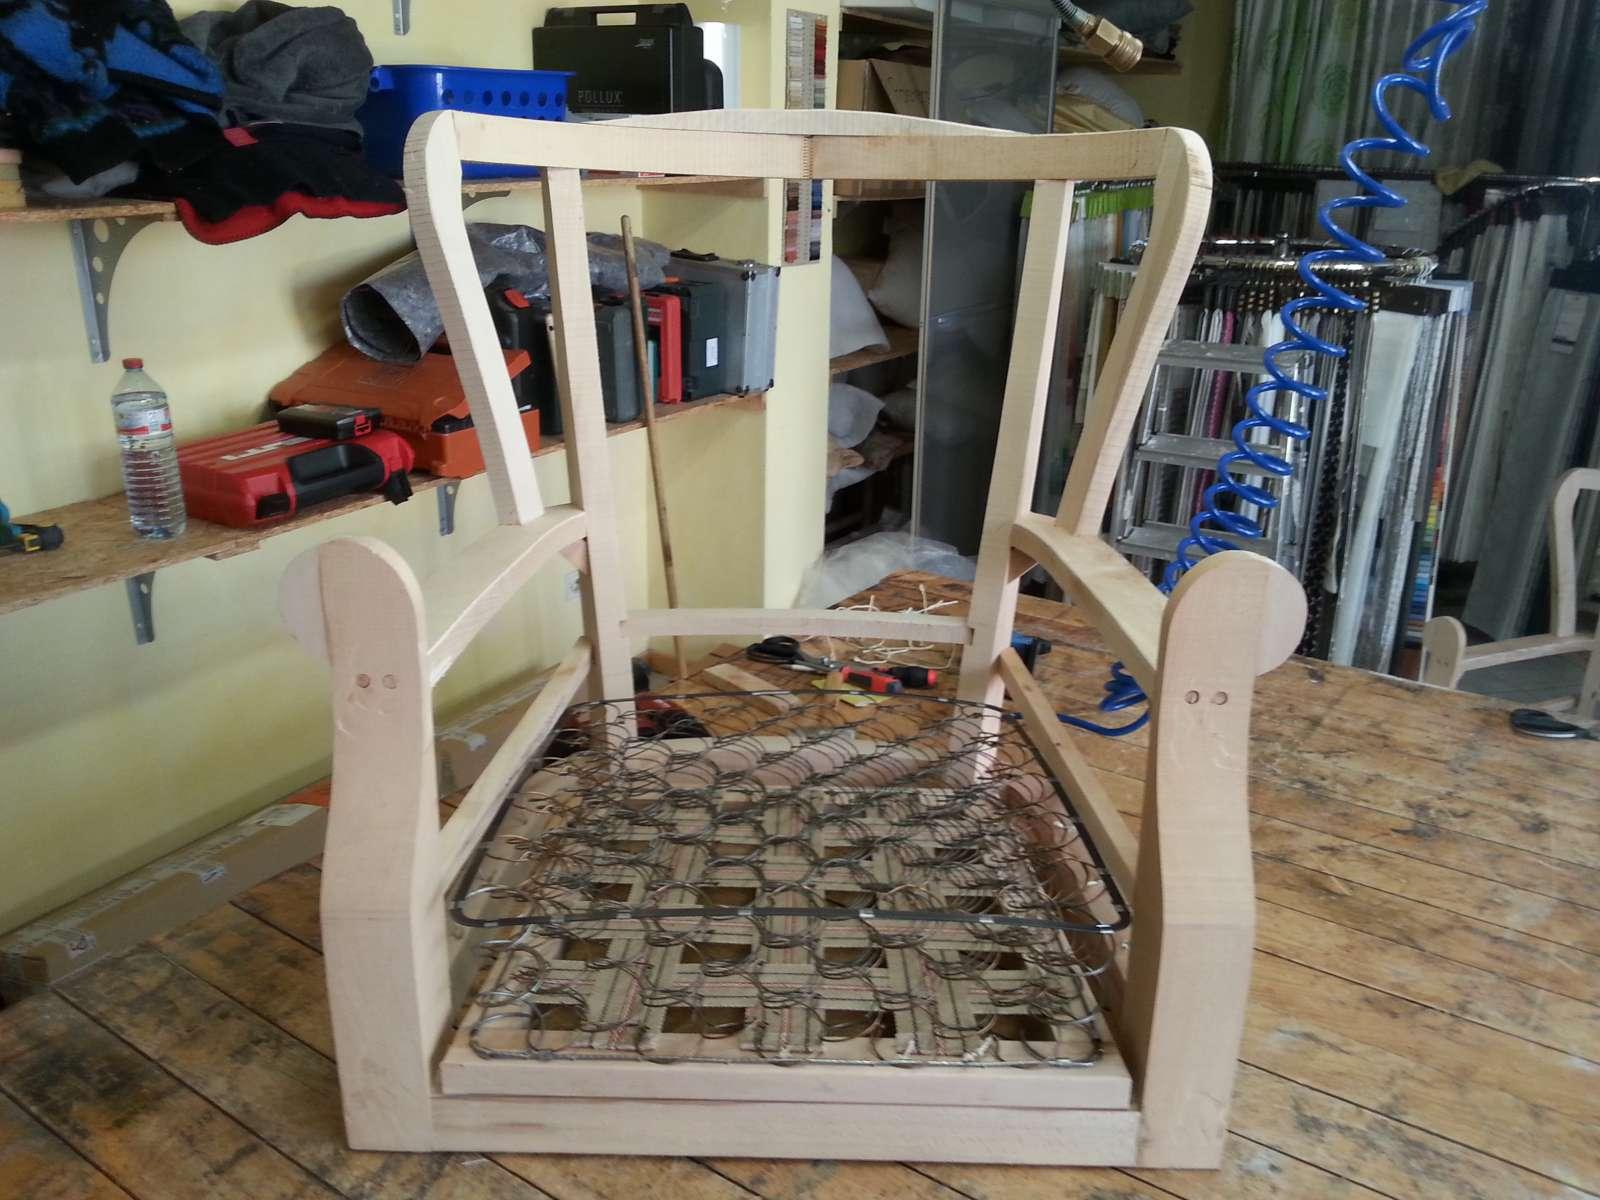 polsterei karlsruhe blum raumausstatter. Black Bedroom Furniture Sets. Home Design Ideas